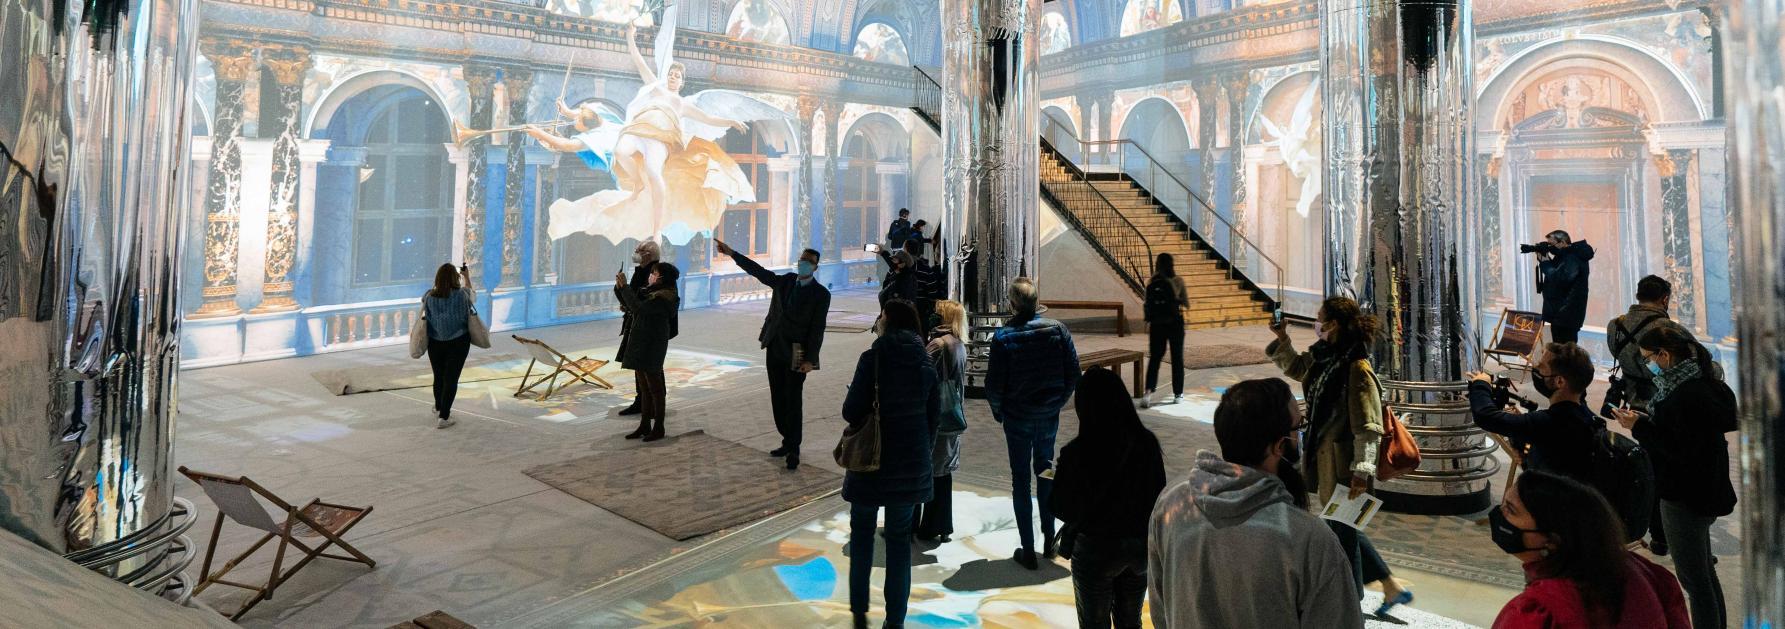 Klimt - The immersive expo